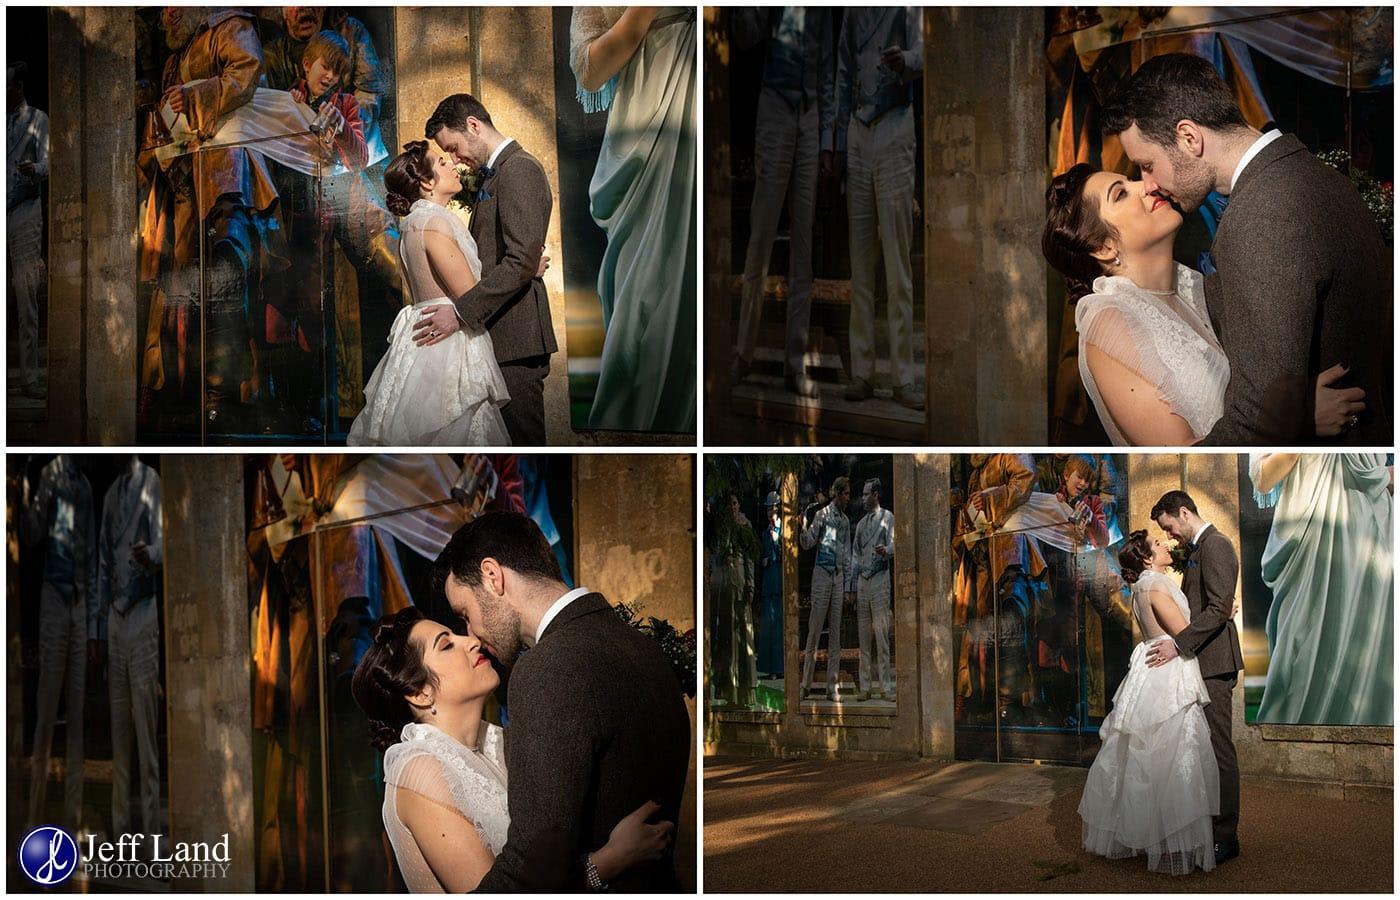 Wedding, Photographer, Photography, Stratford upon Avon, Stratford-upon-Avon, Warwickshire, The Henley Room, Arden Hotel